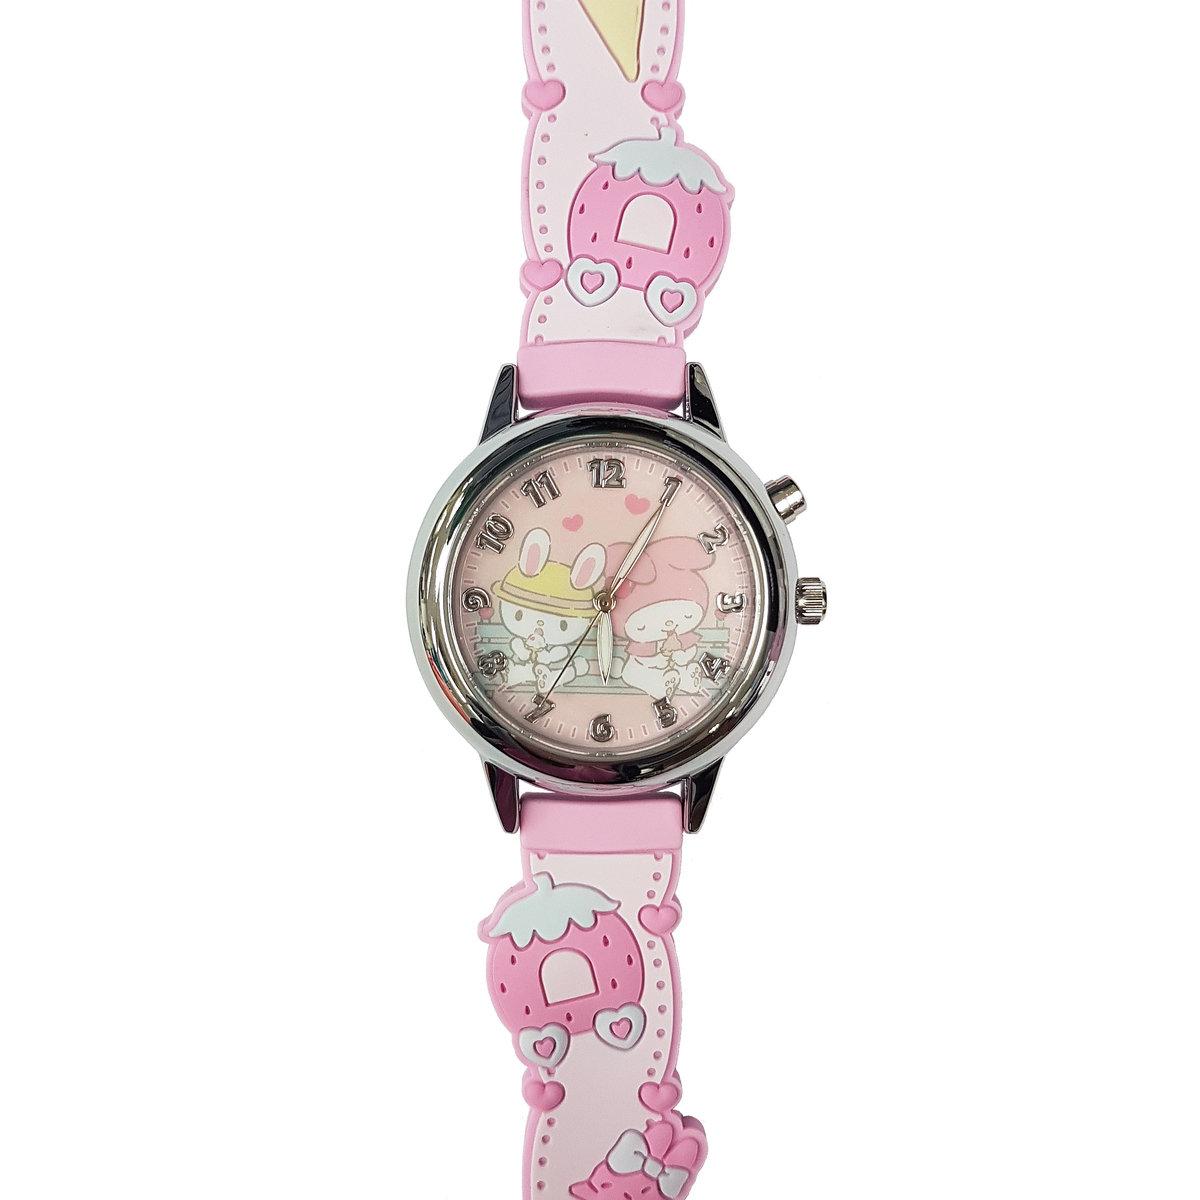 SANRIO - My Melody light up quartz watch (Pink)